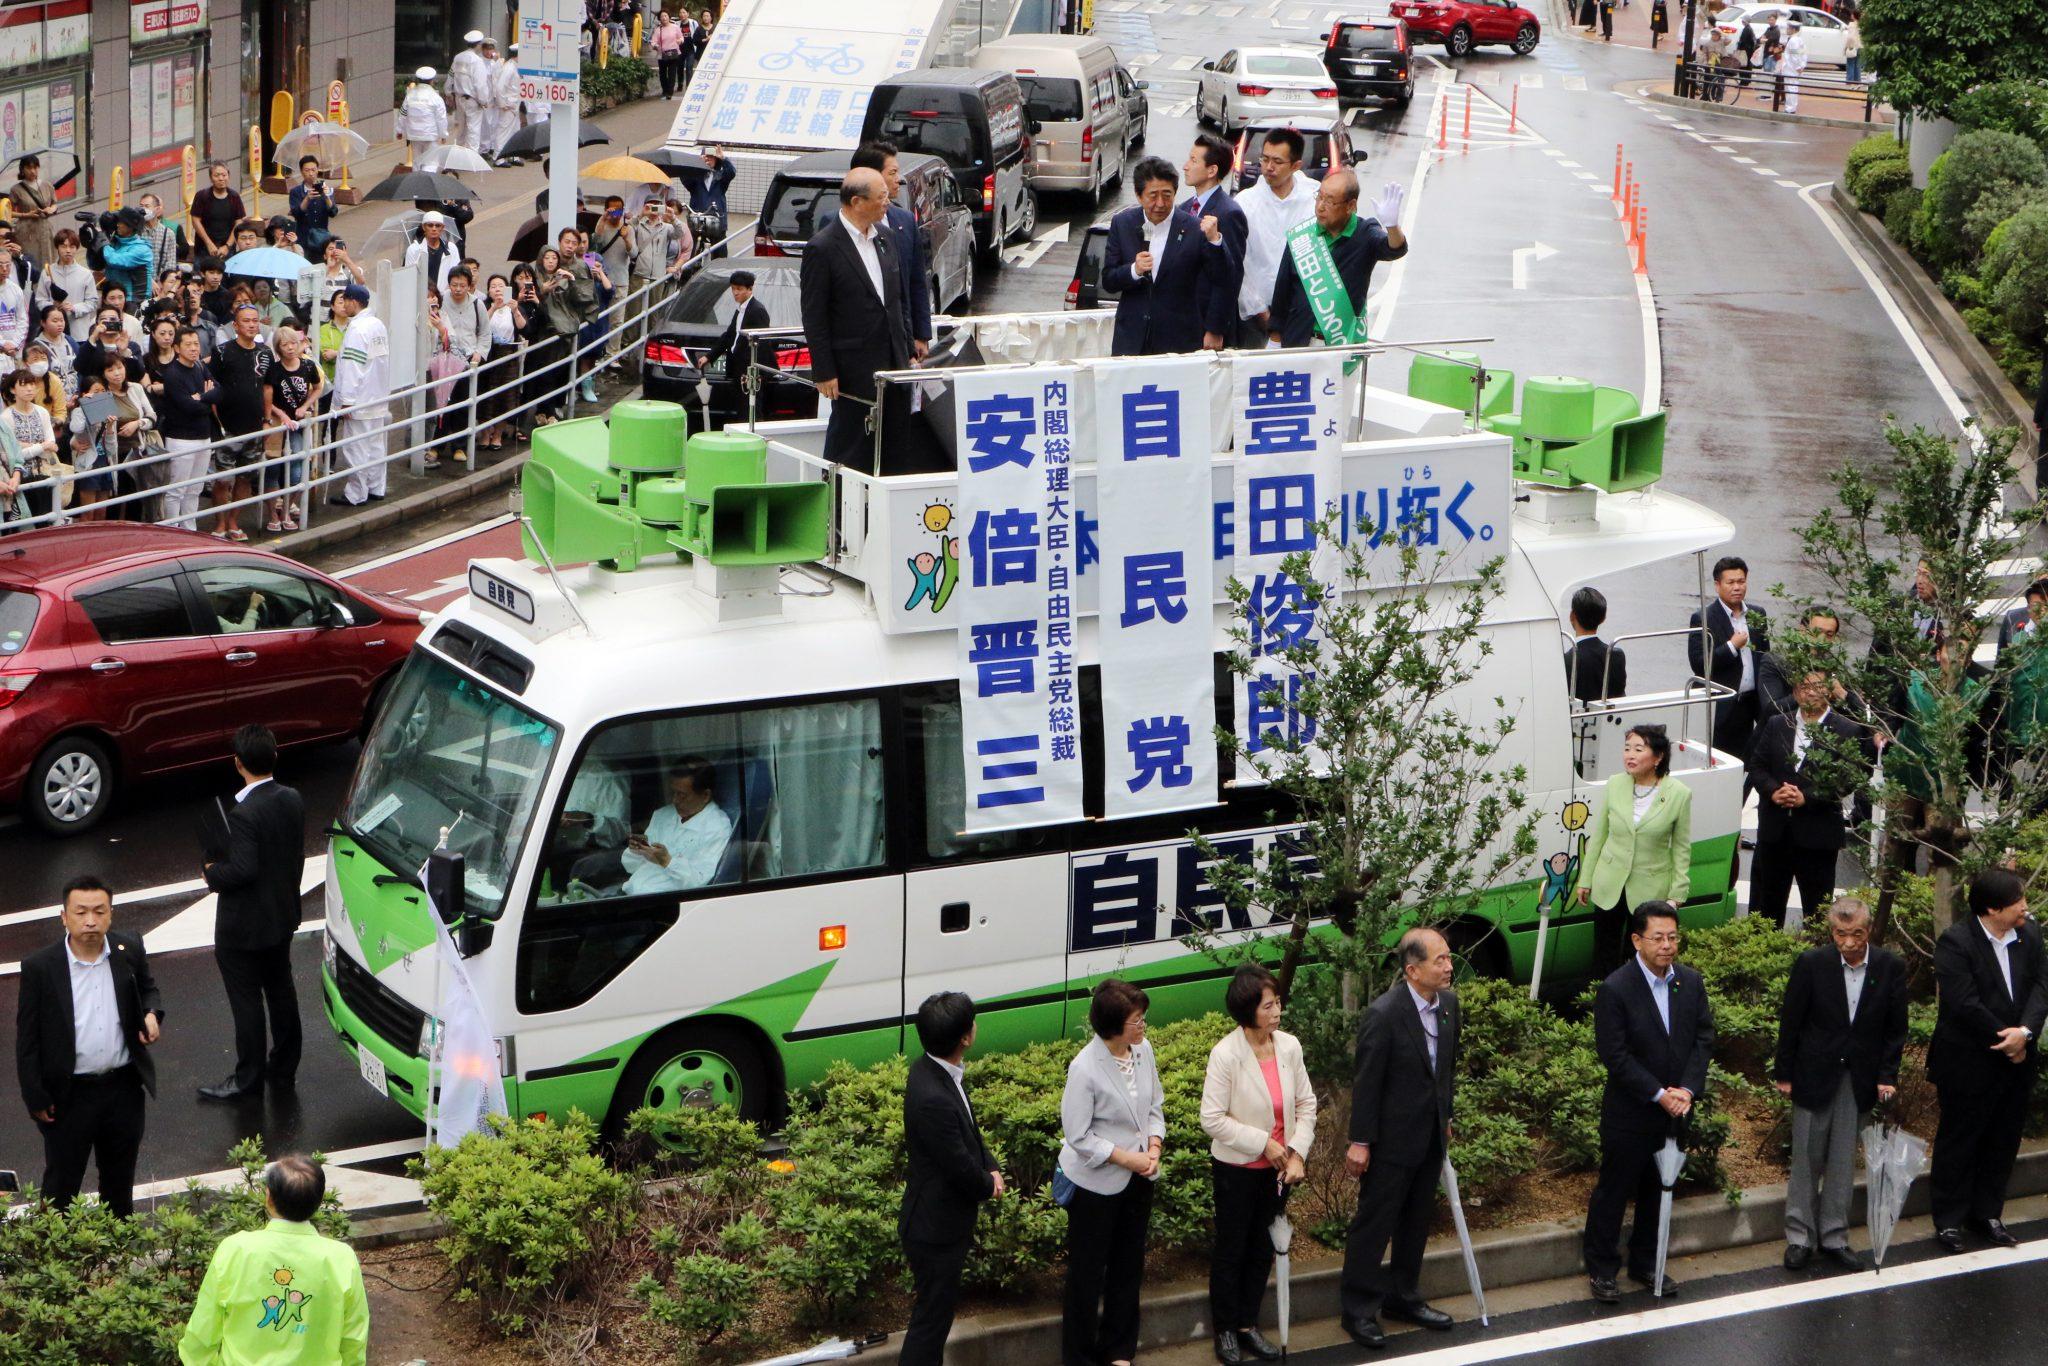 Japan's post-populist democracy